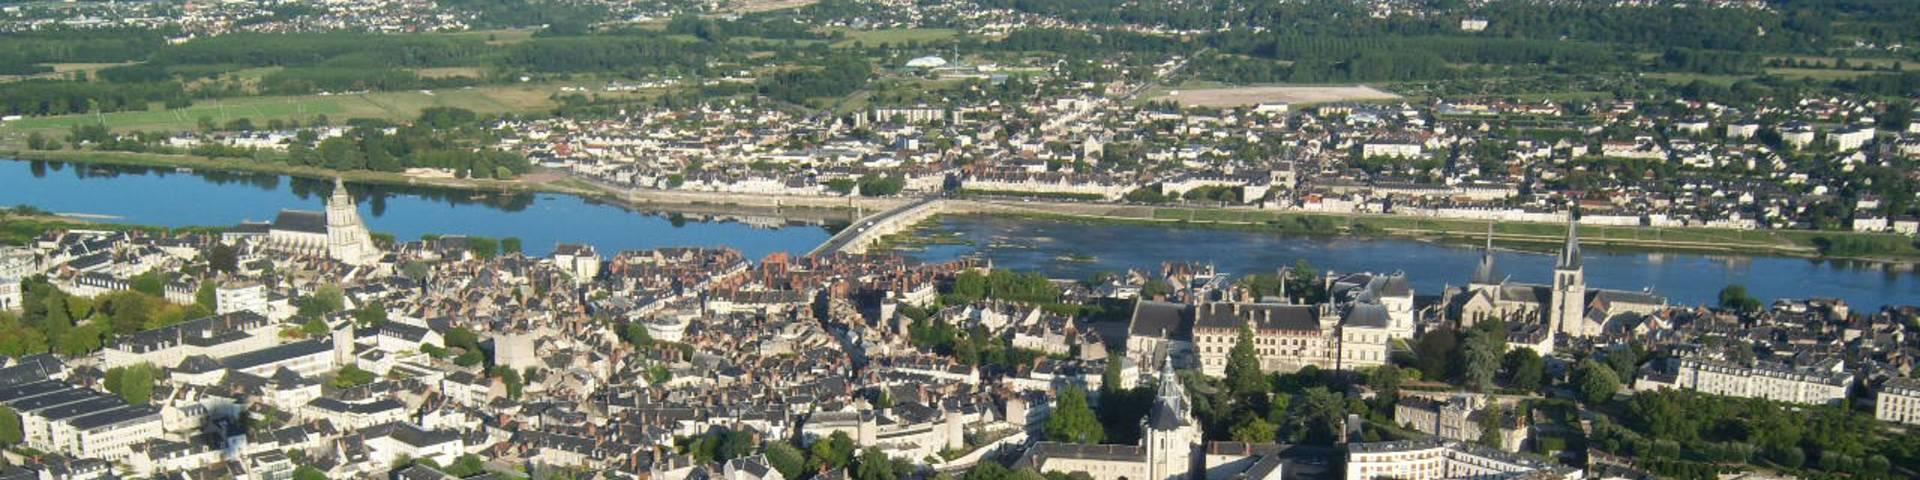 Sorvolo di Blois in mongolfiera